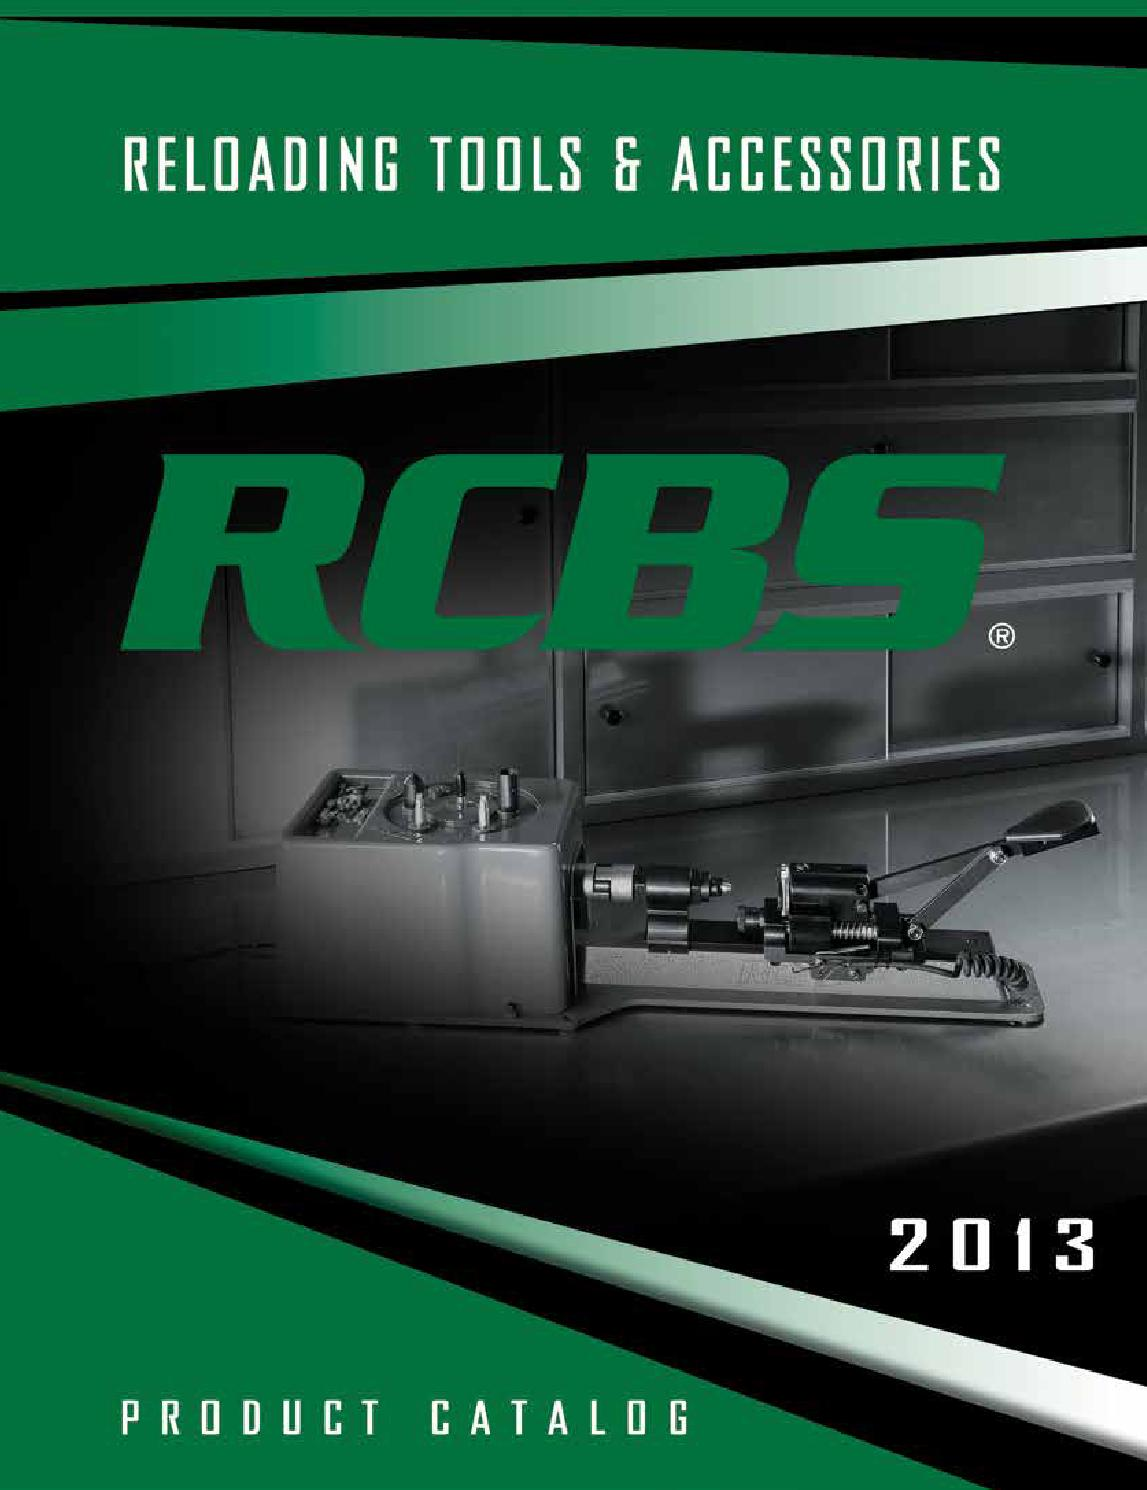 Rcbs catalog eng 2013 by Bignami S p A  - issuu